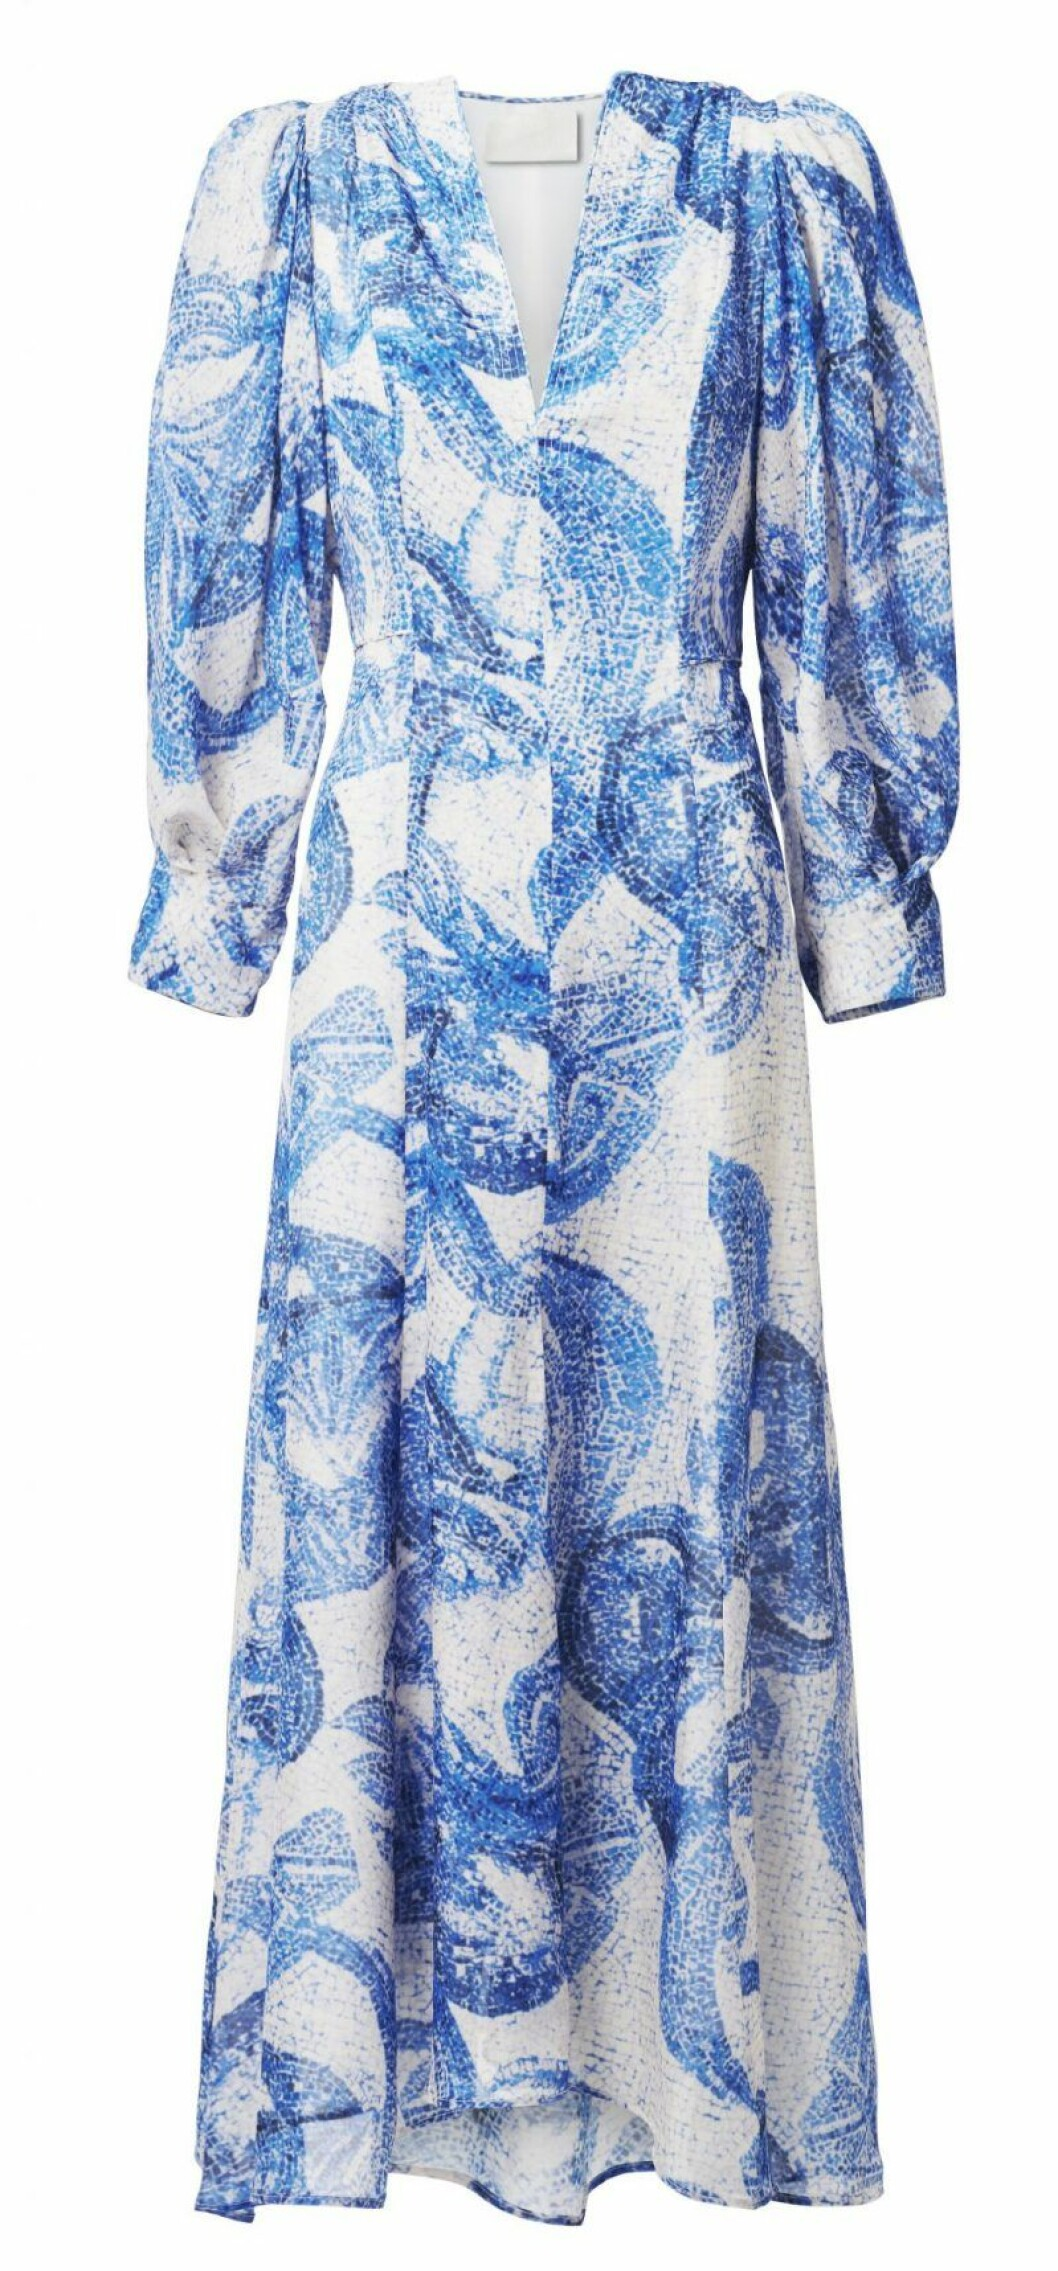 H&M Conscious Exclusive blåvit klänning